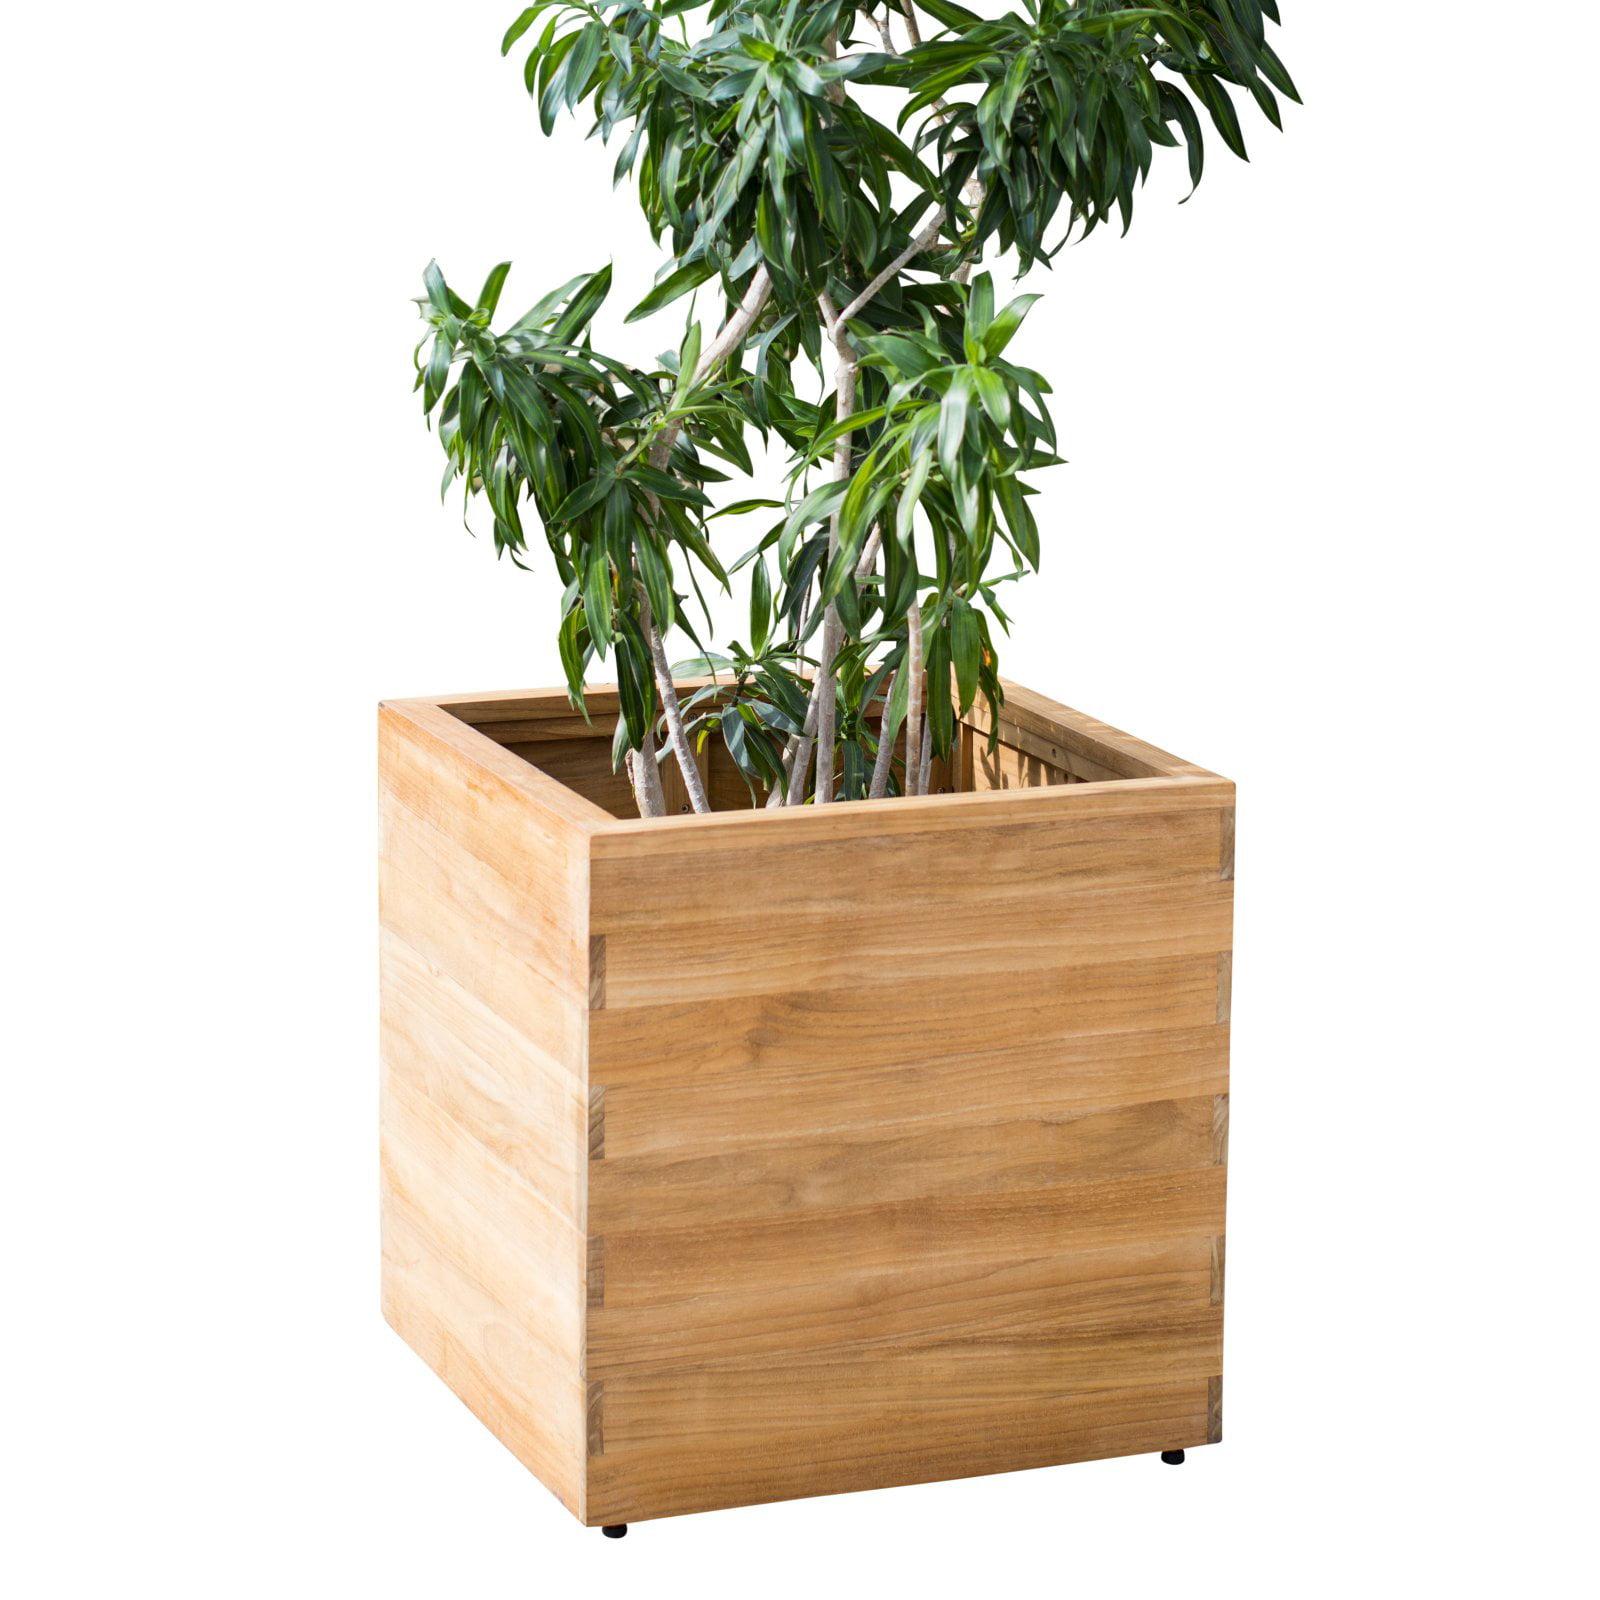 MoDRN Teak Wood Square Planter